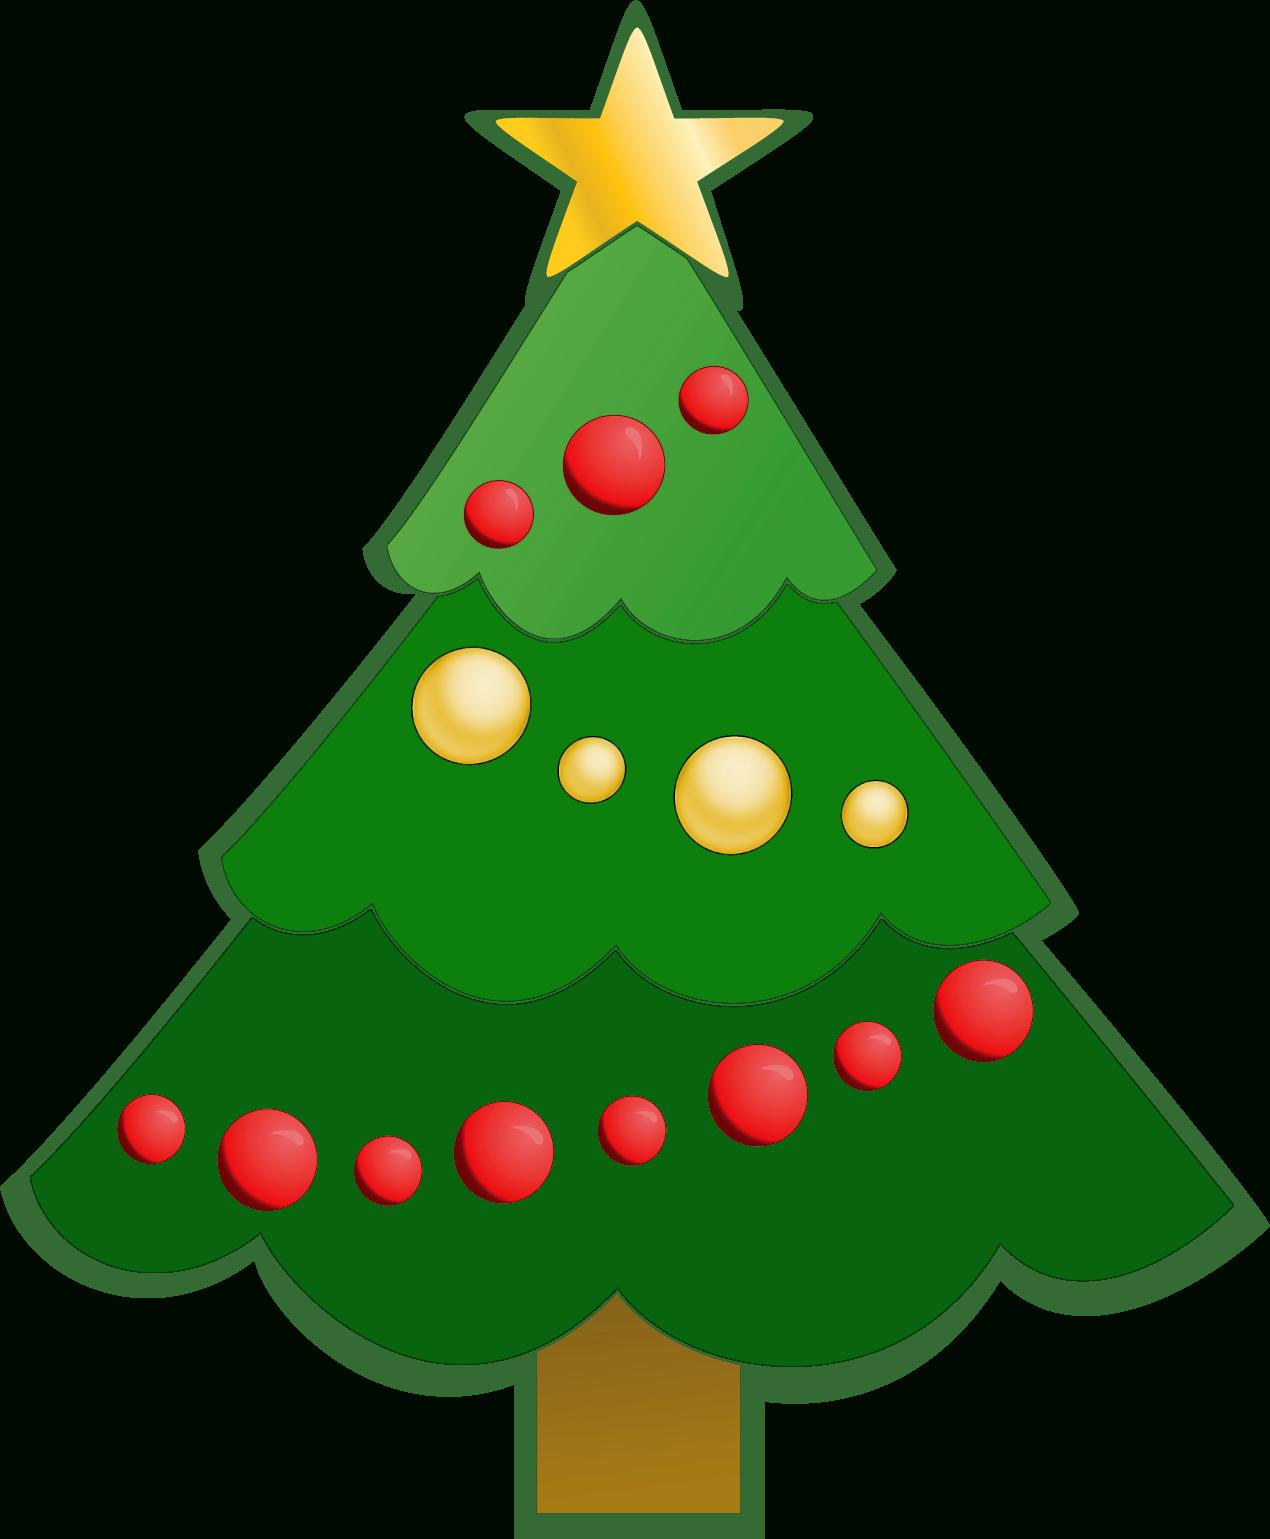 1270x1539 Christmas ~ Clip Art Christmas Tree Outline Clipart Panda Free